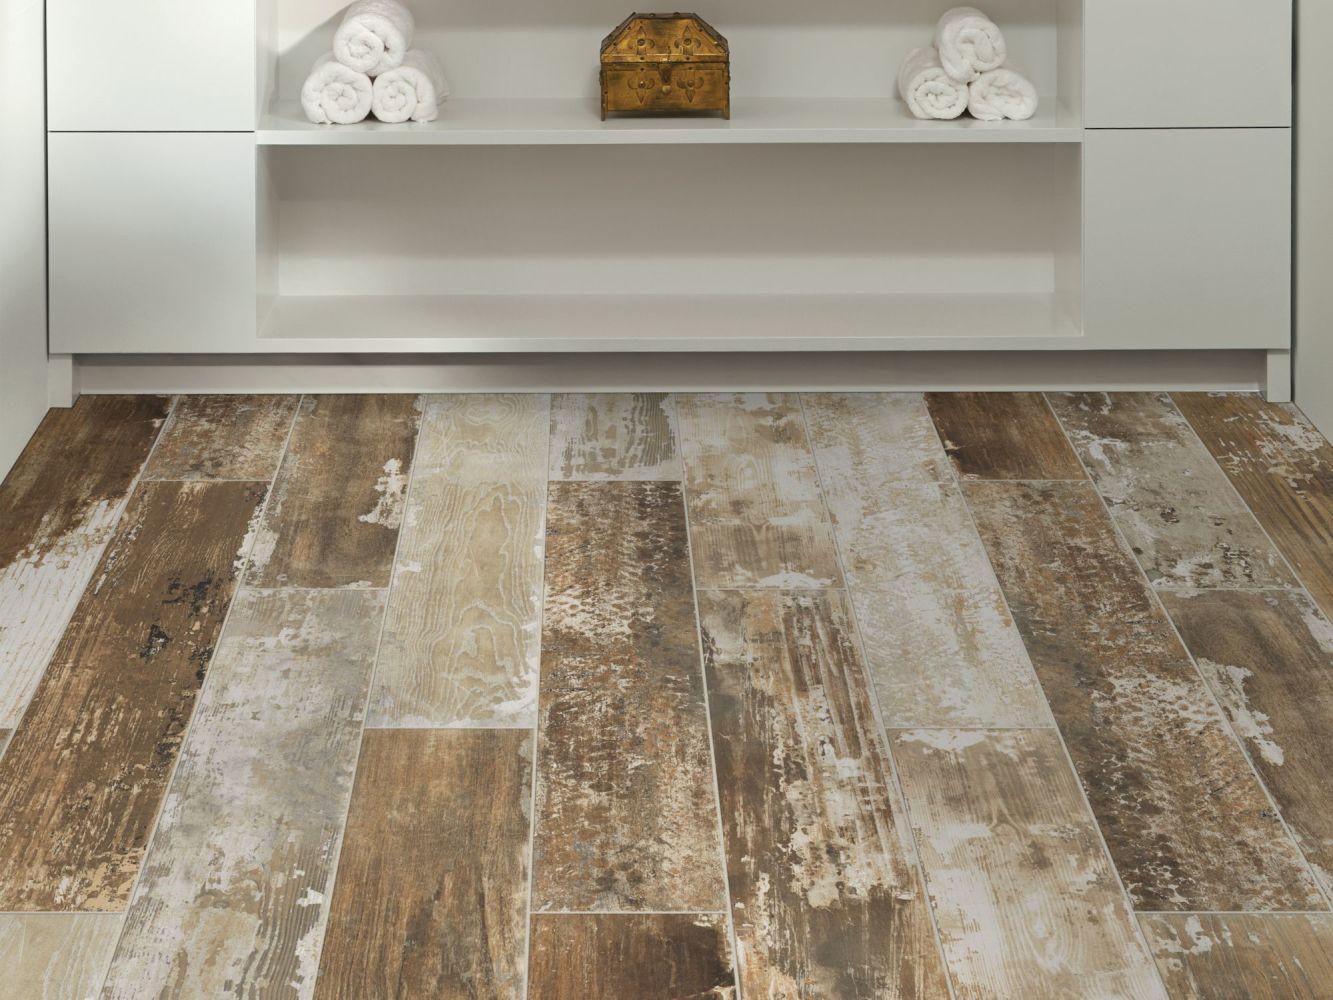 Shaw Floors Home Fn Gold Ceramic Sleepy Hollow 6×36 Beech 00170_TG26B